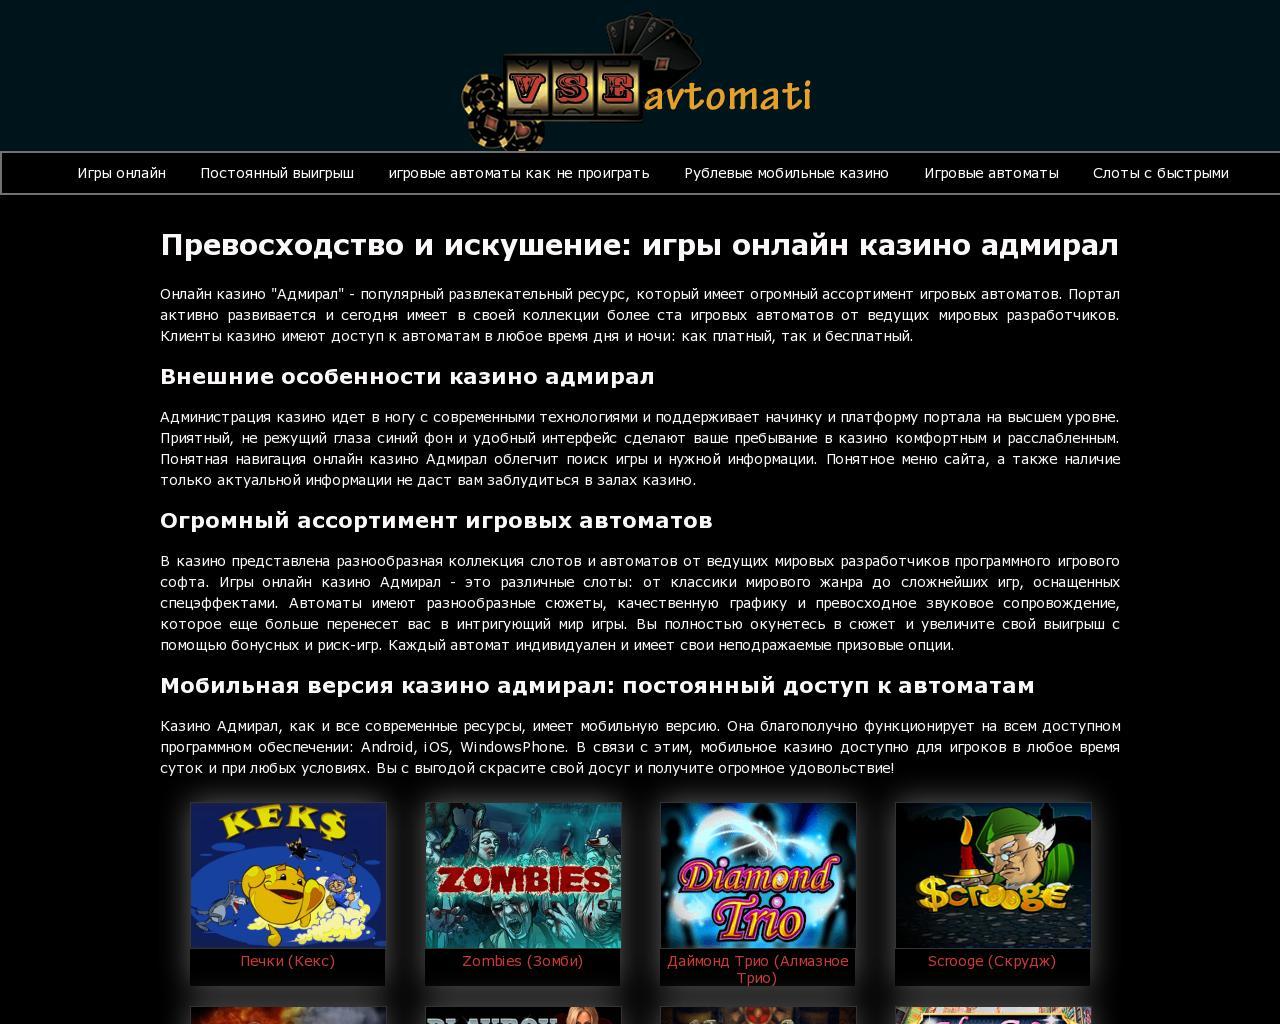 Выбор игр в казино онлайн Адмирал